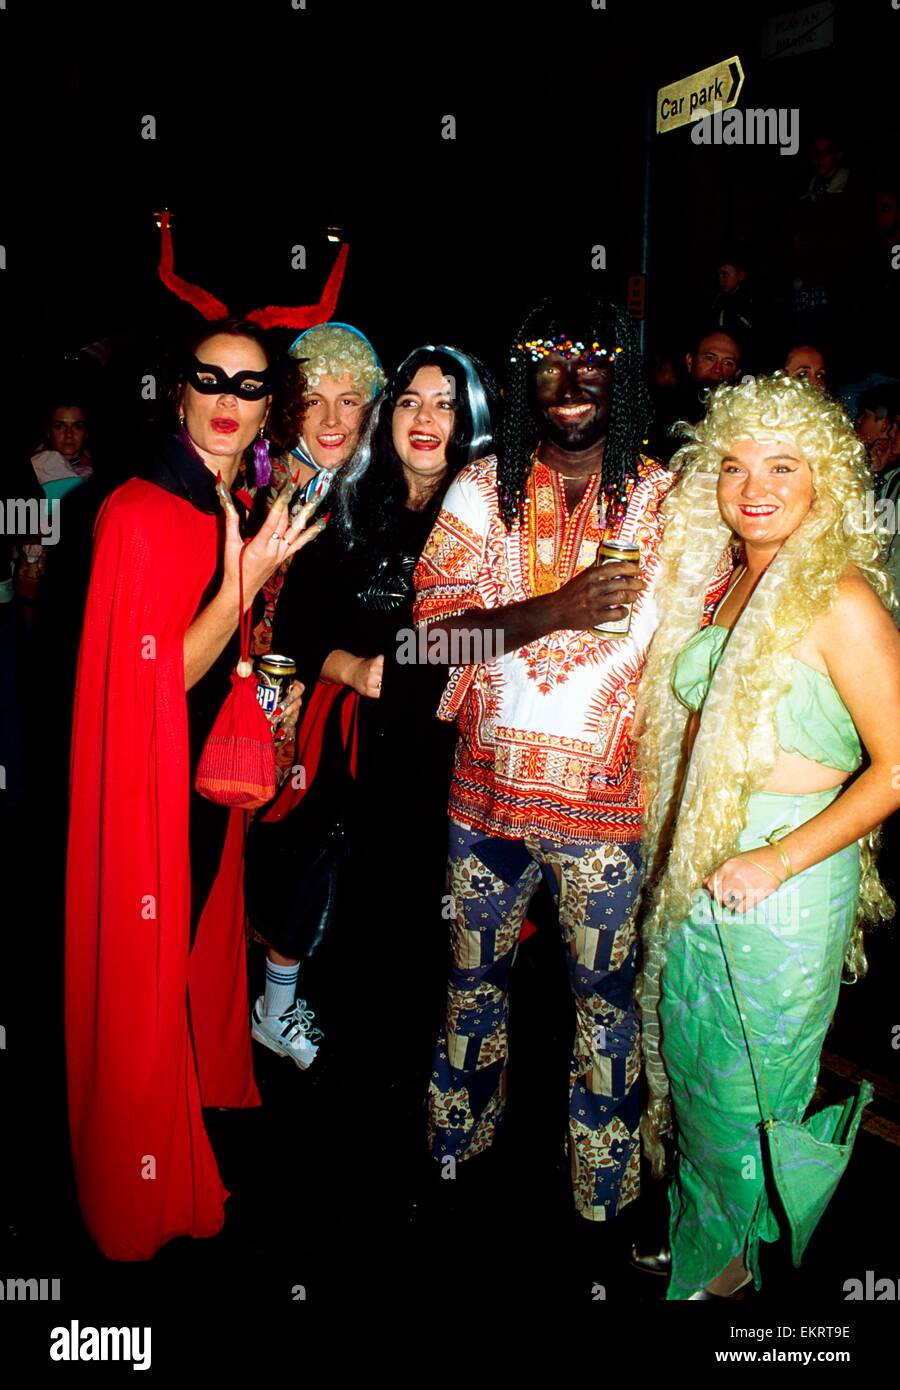 Derry, Ireland; Halloween Street Party In 1995 Stock Photo ...